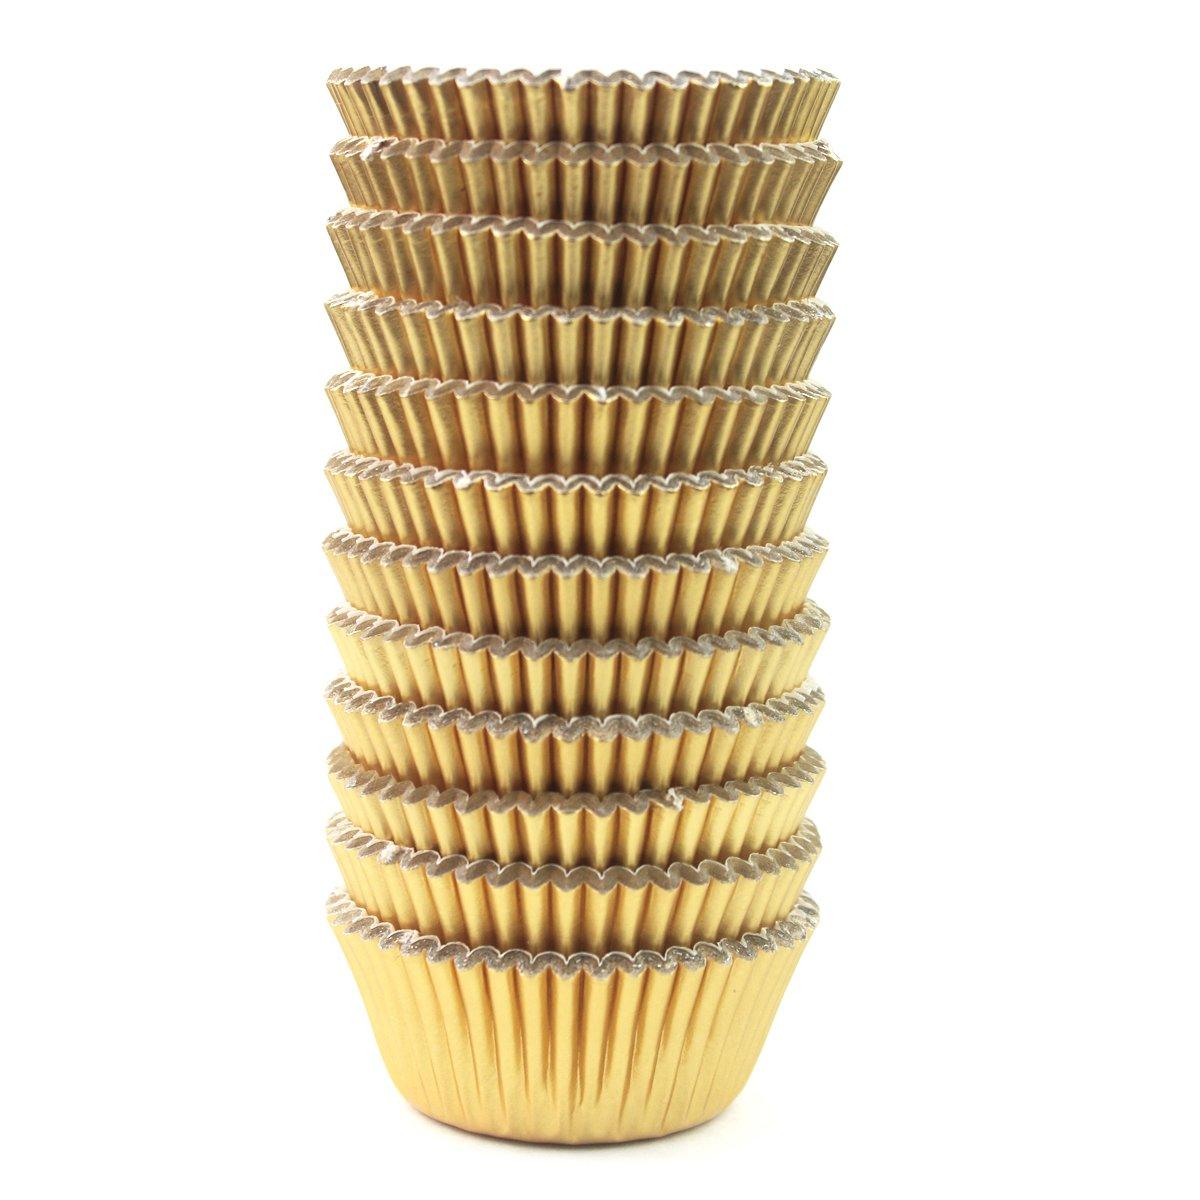 Eoonfirst Mini Foil Metallic Paper Cupcake Cup Liners/Baking Cups 300 Pcs (Gold)